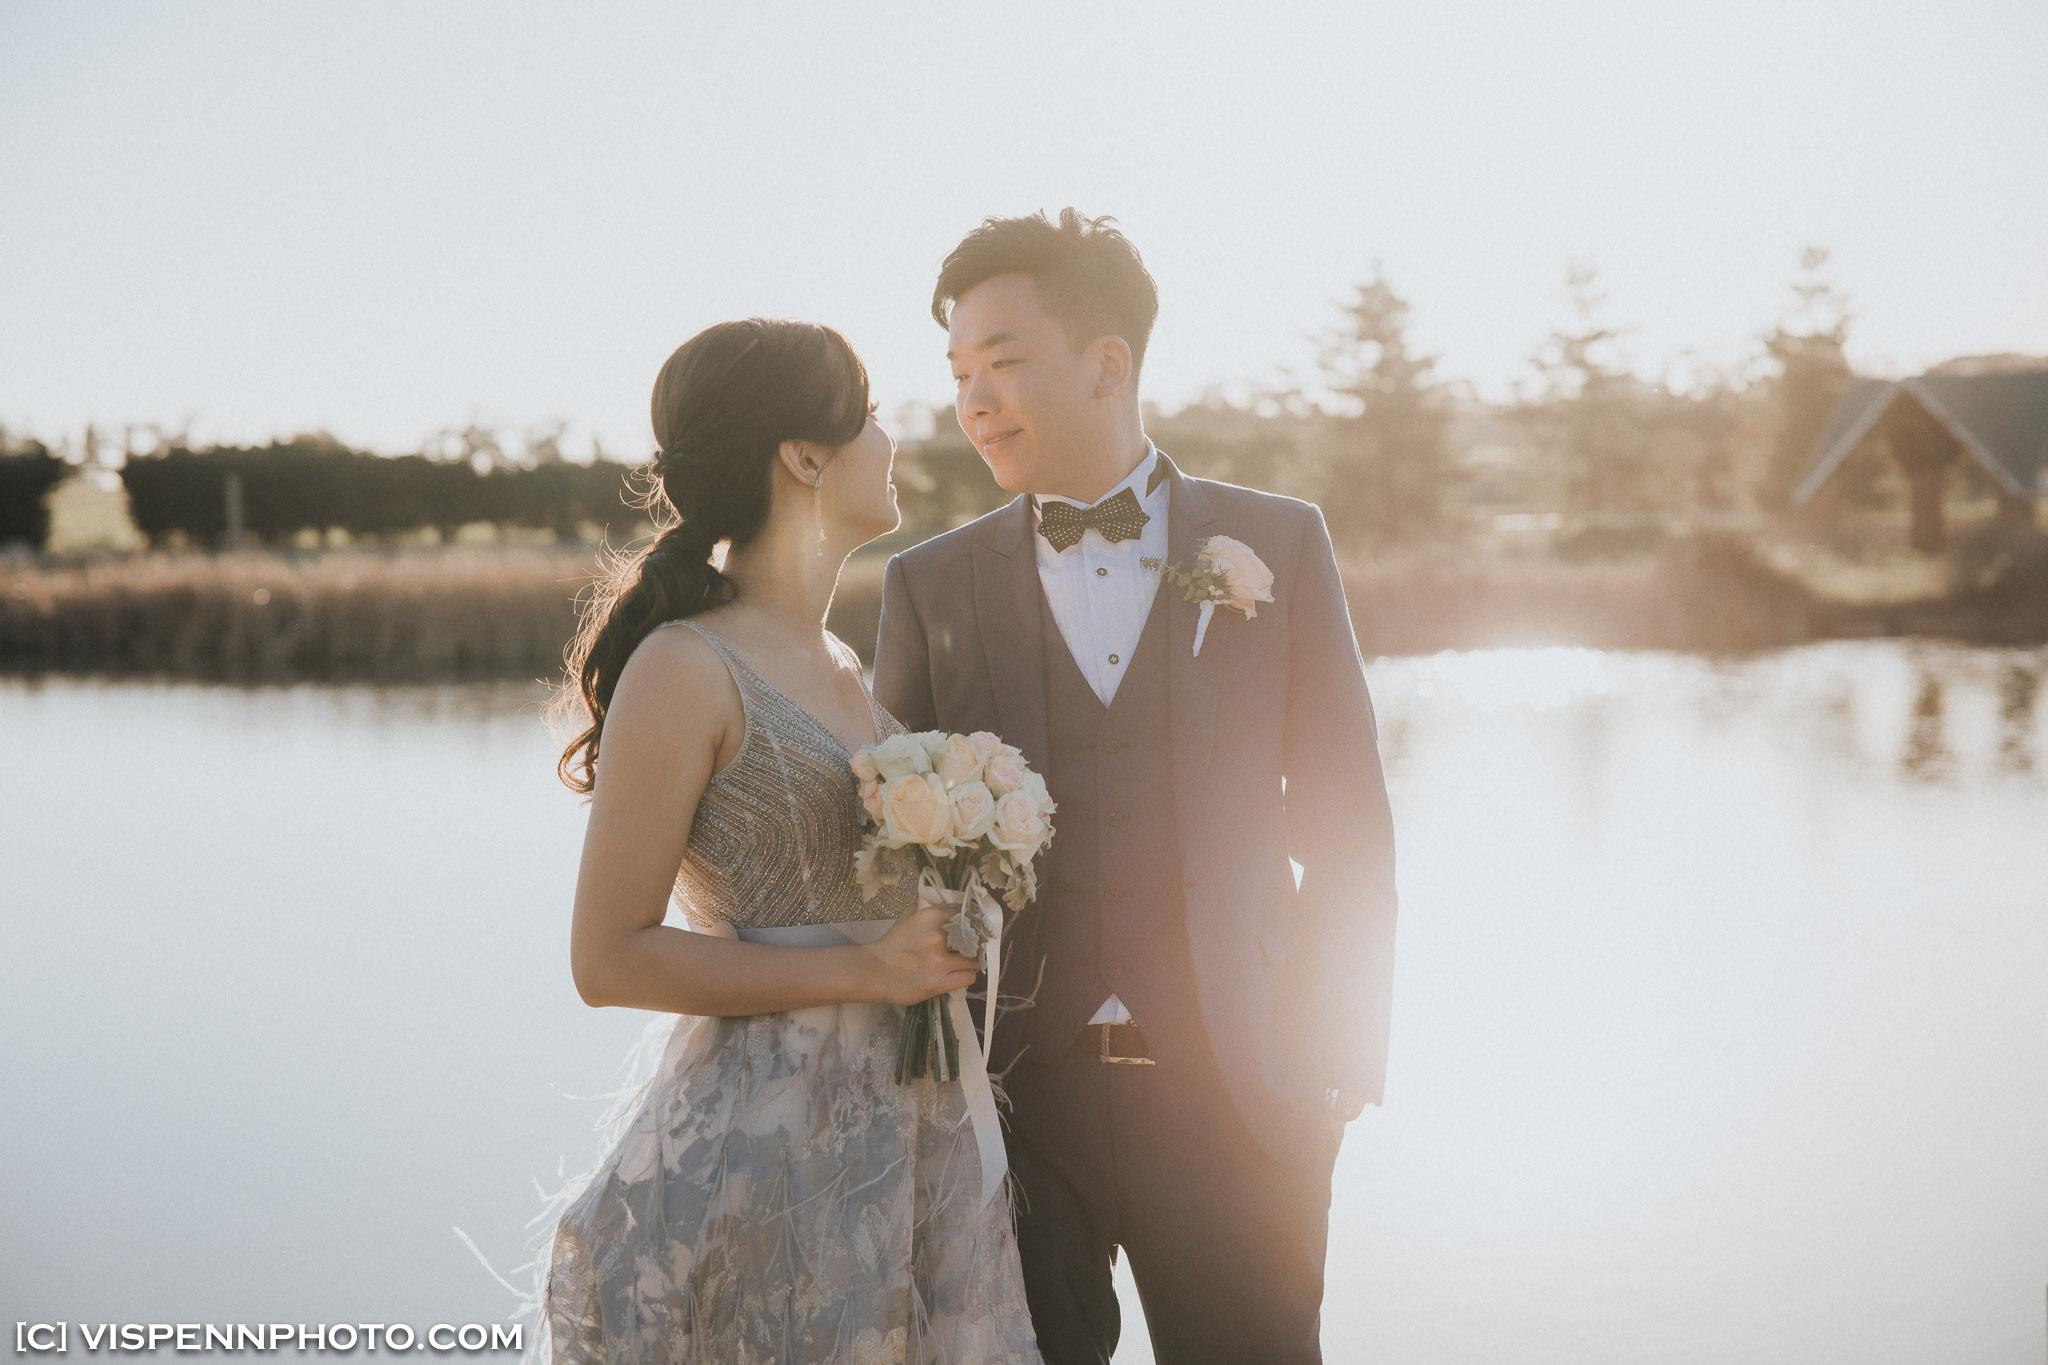 WEDDING DAY Photography Melbourne VISPENN 墨尔本 婚礼跟拍 婚礼摄像 婚礼摄影 结婚照 登记照 AndyIcyWED 9742 EOSR VISPENN